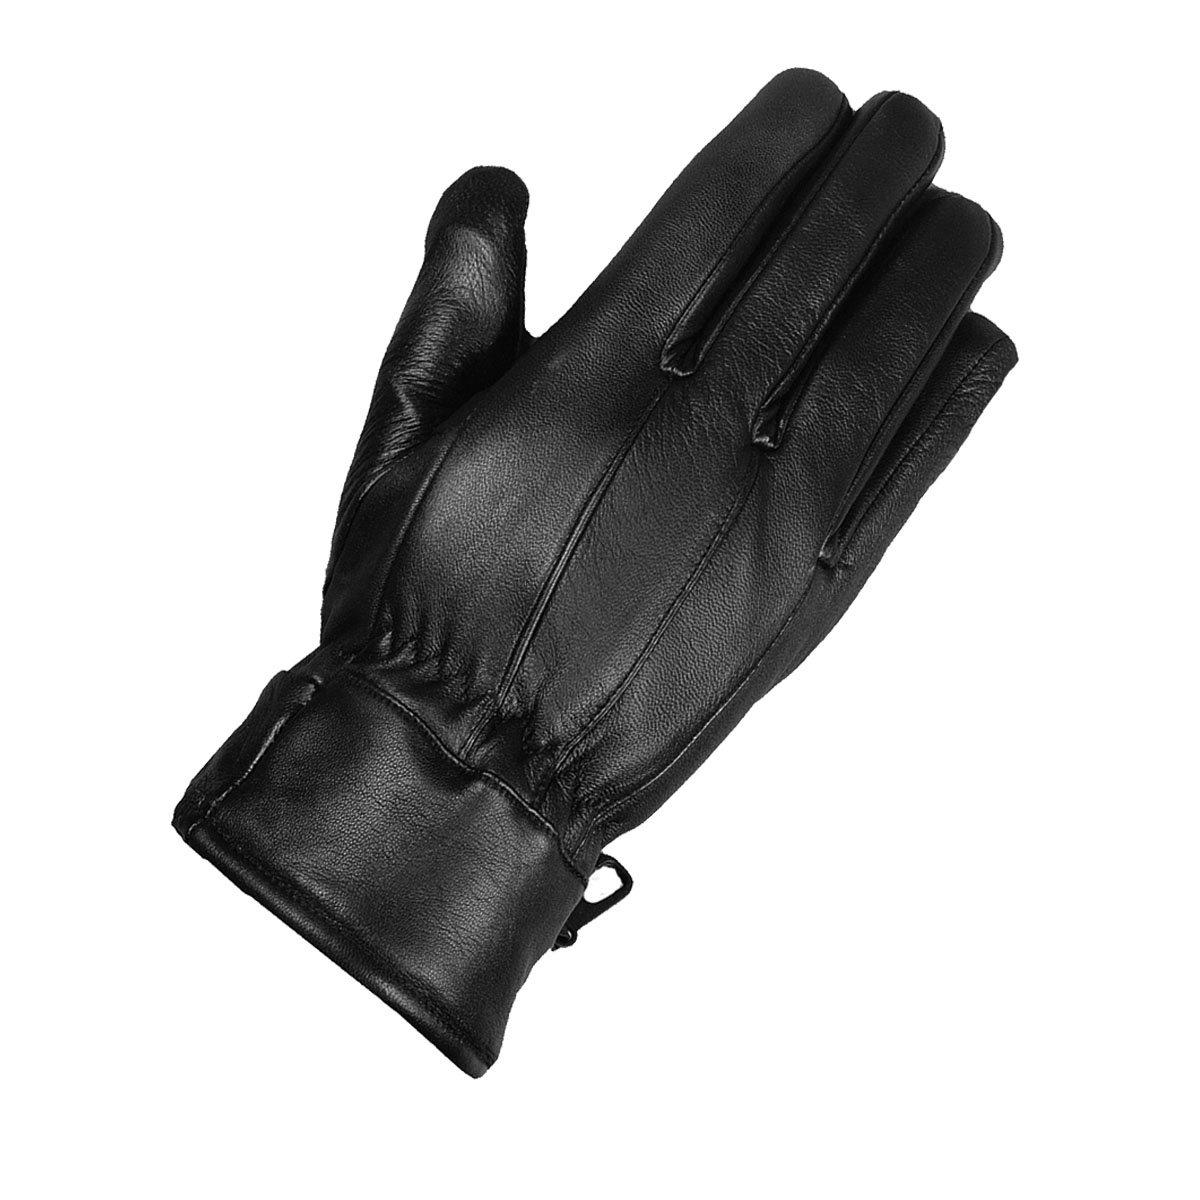 Premium Men's Winter Insulated Black Leather Gloves